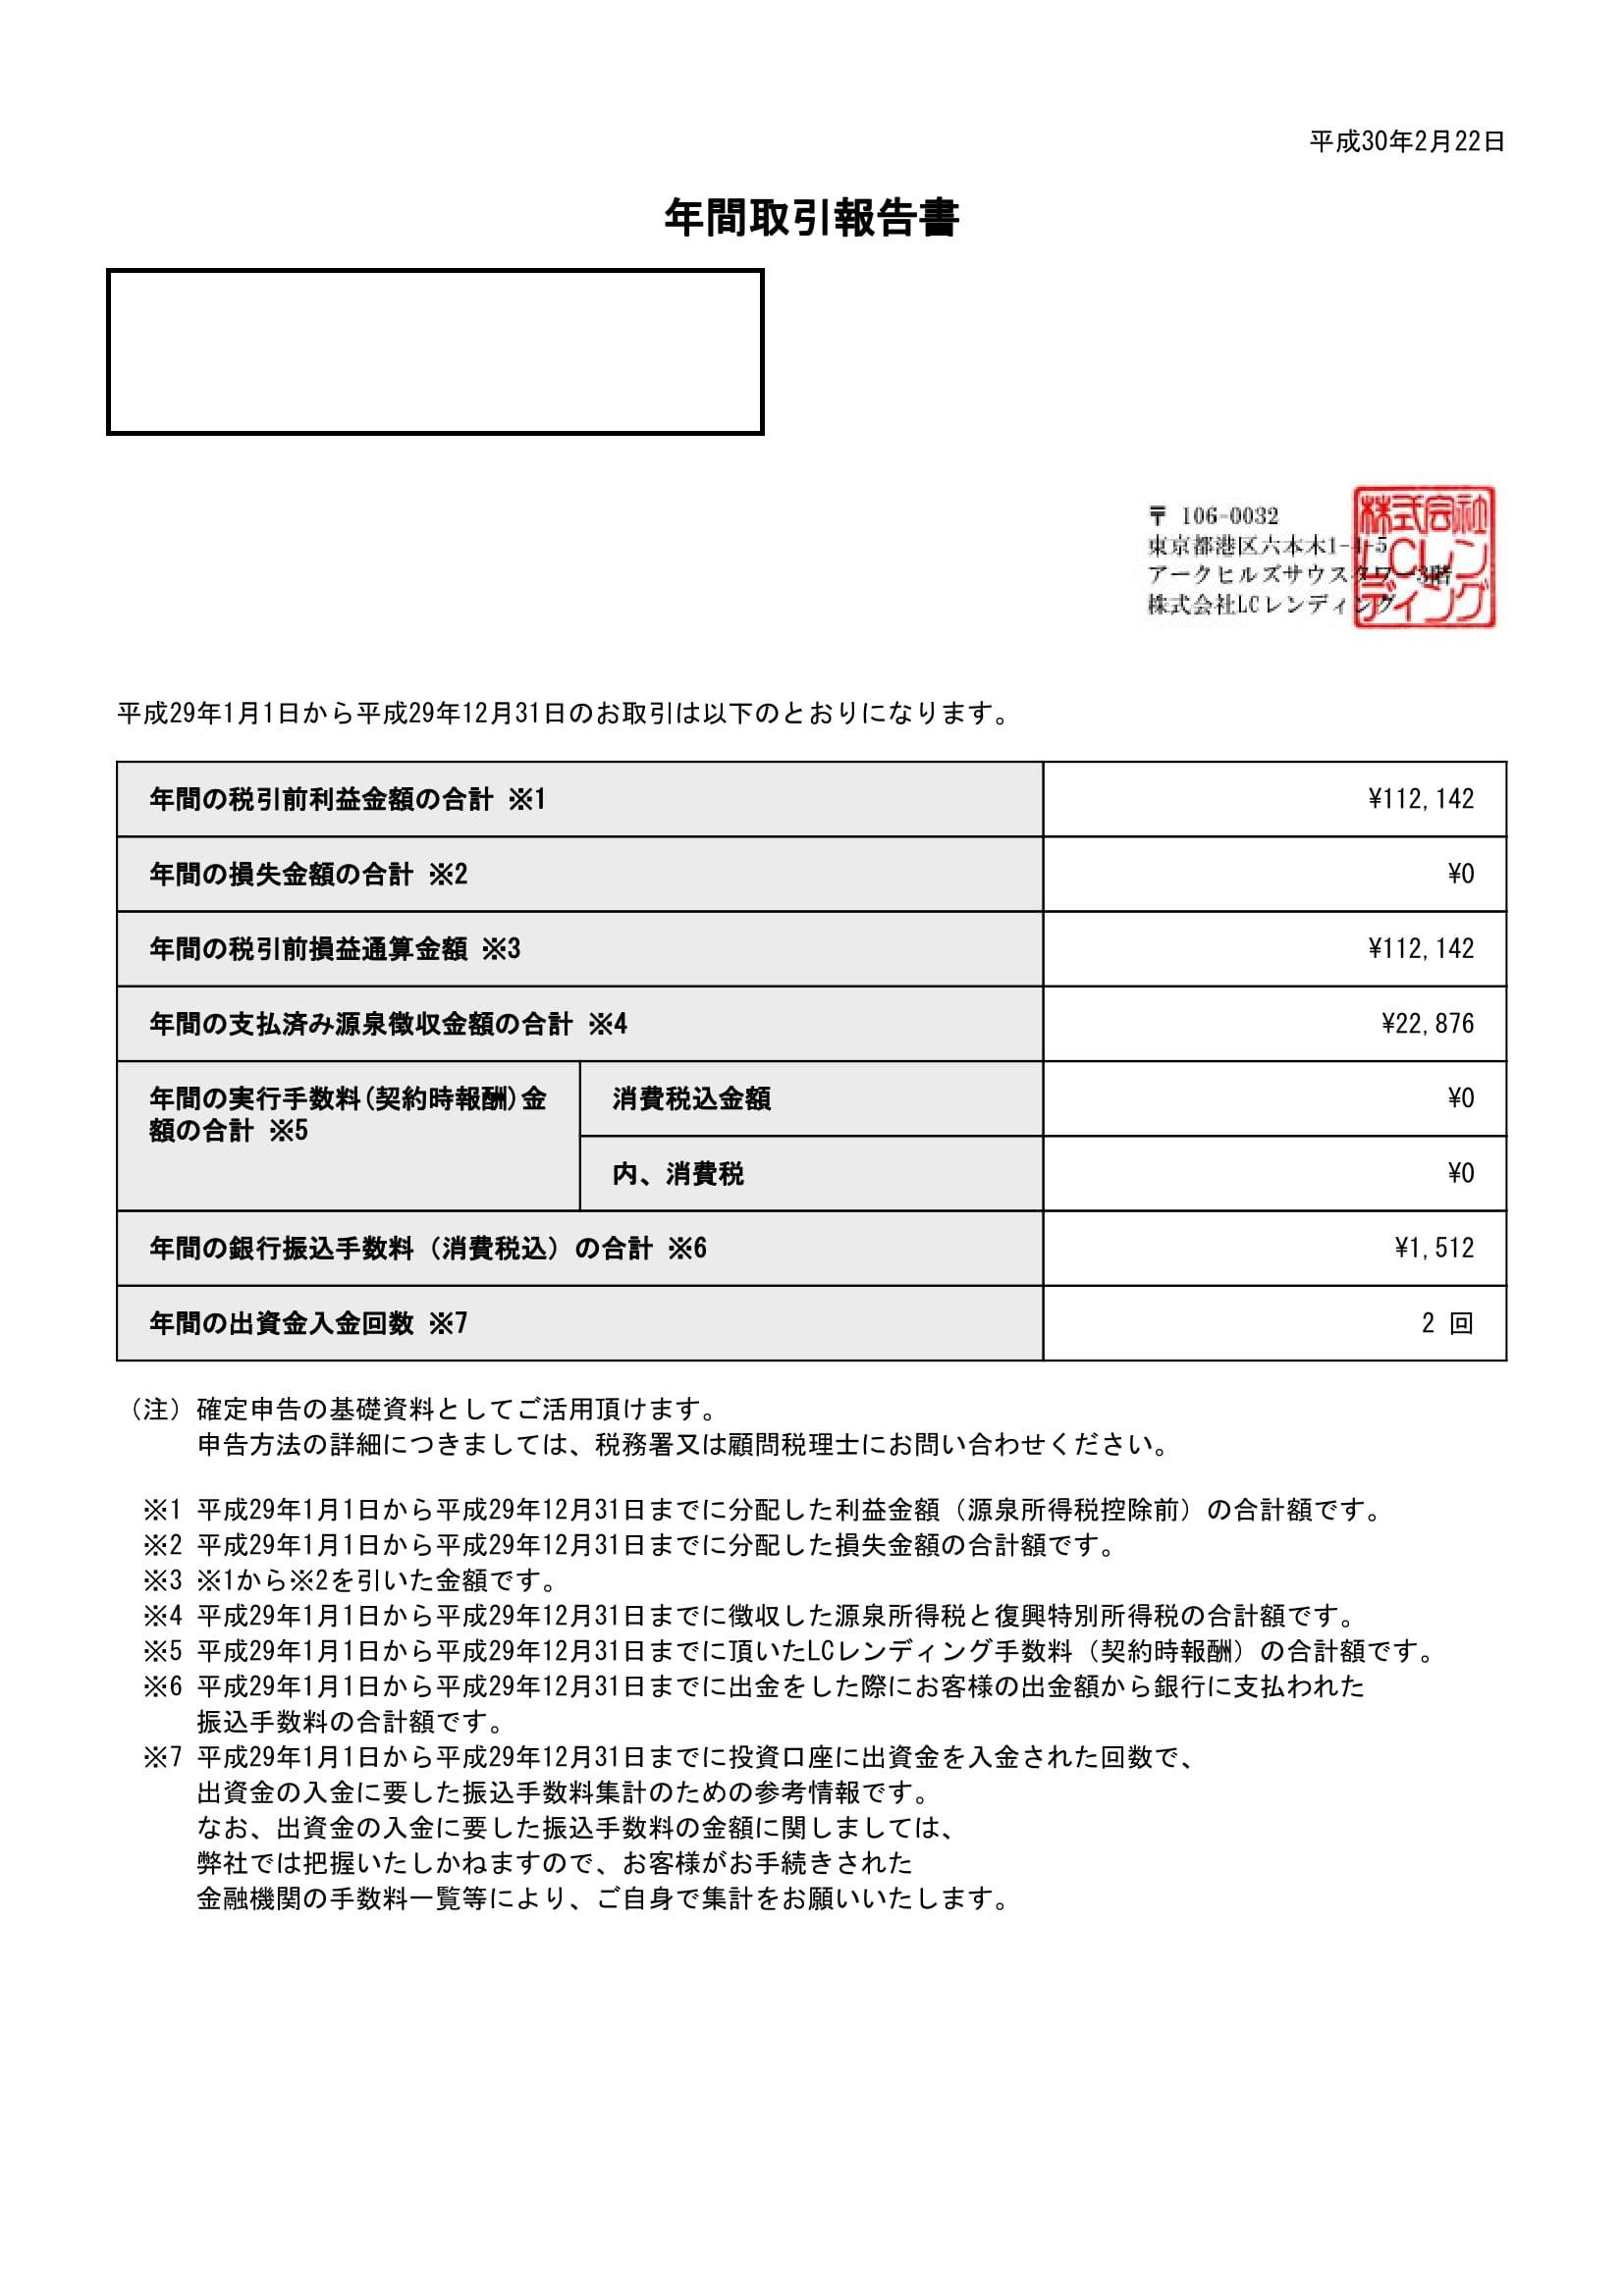 LCLENDING年間取引報告書_353_20180222-1